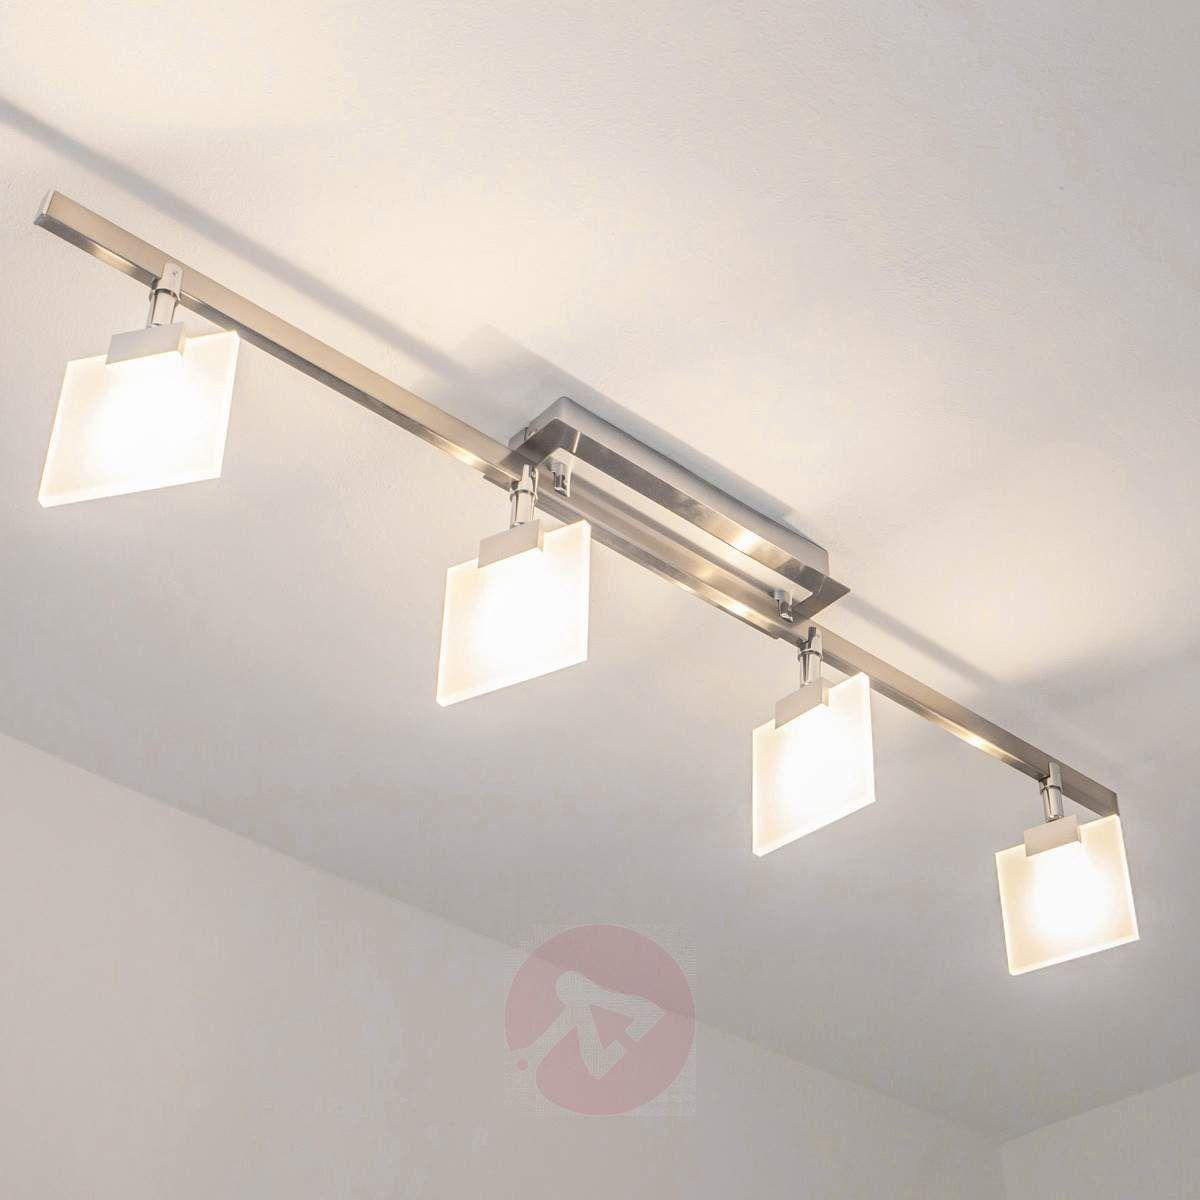 Livius Kitchen Ceiling Light With COB LEDs 9614046 10